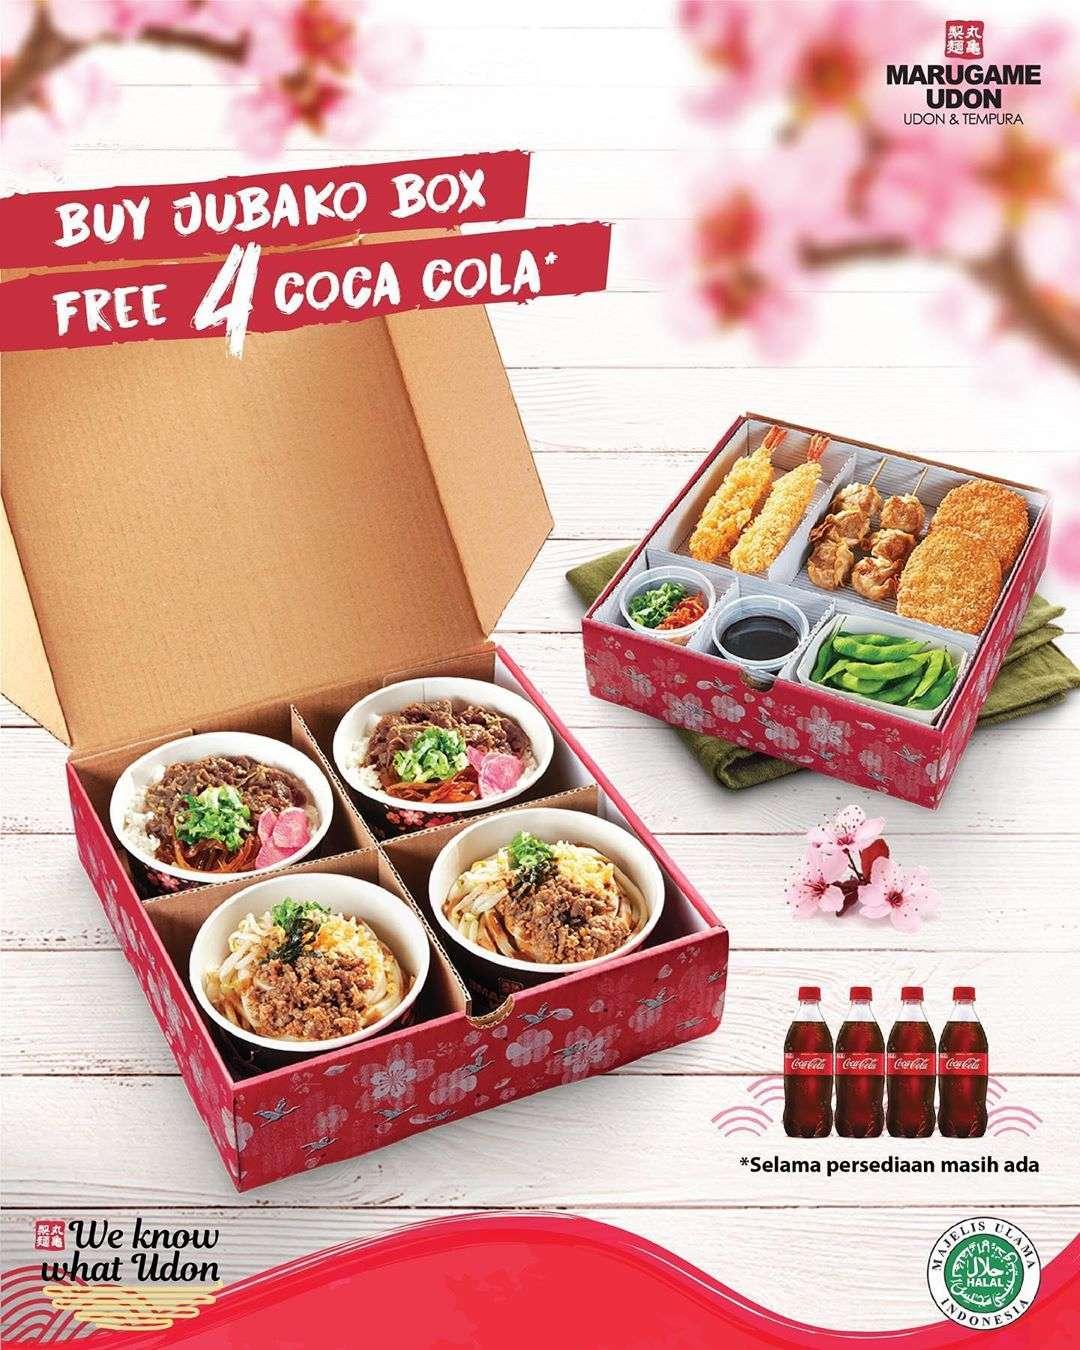 Diskon Marugame Udon Promo Gratis 4 Coca Cola 250ml Setiap Pembelian Jubako Box